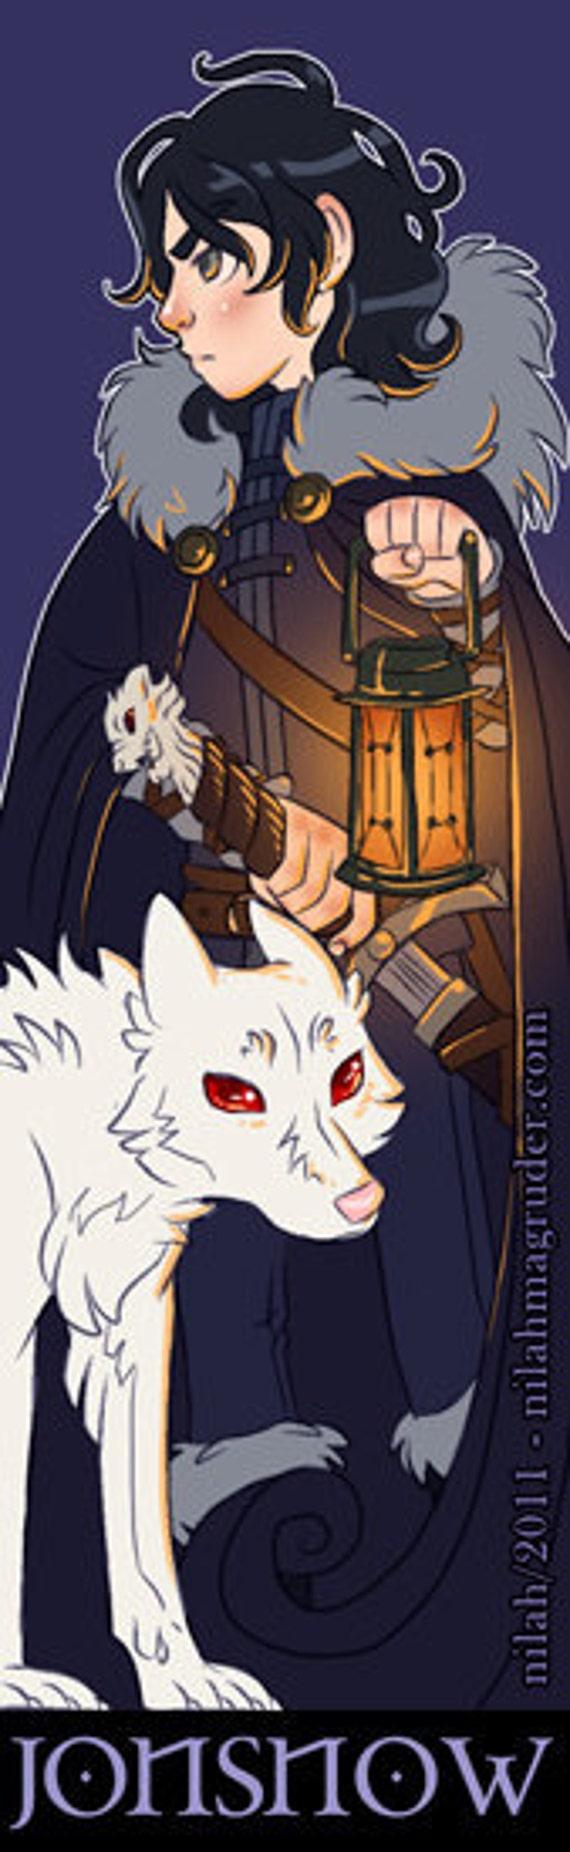 Game of Thrones Bookmark: Jon Snow